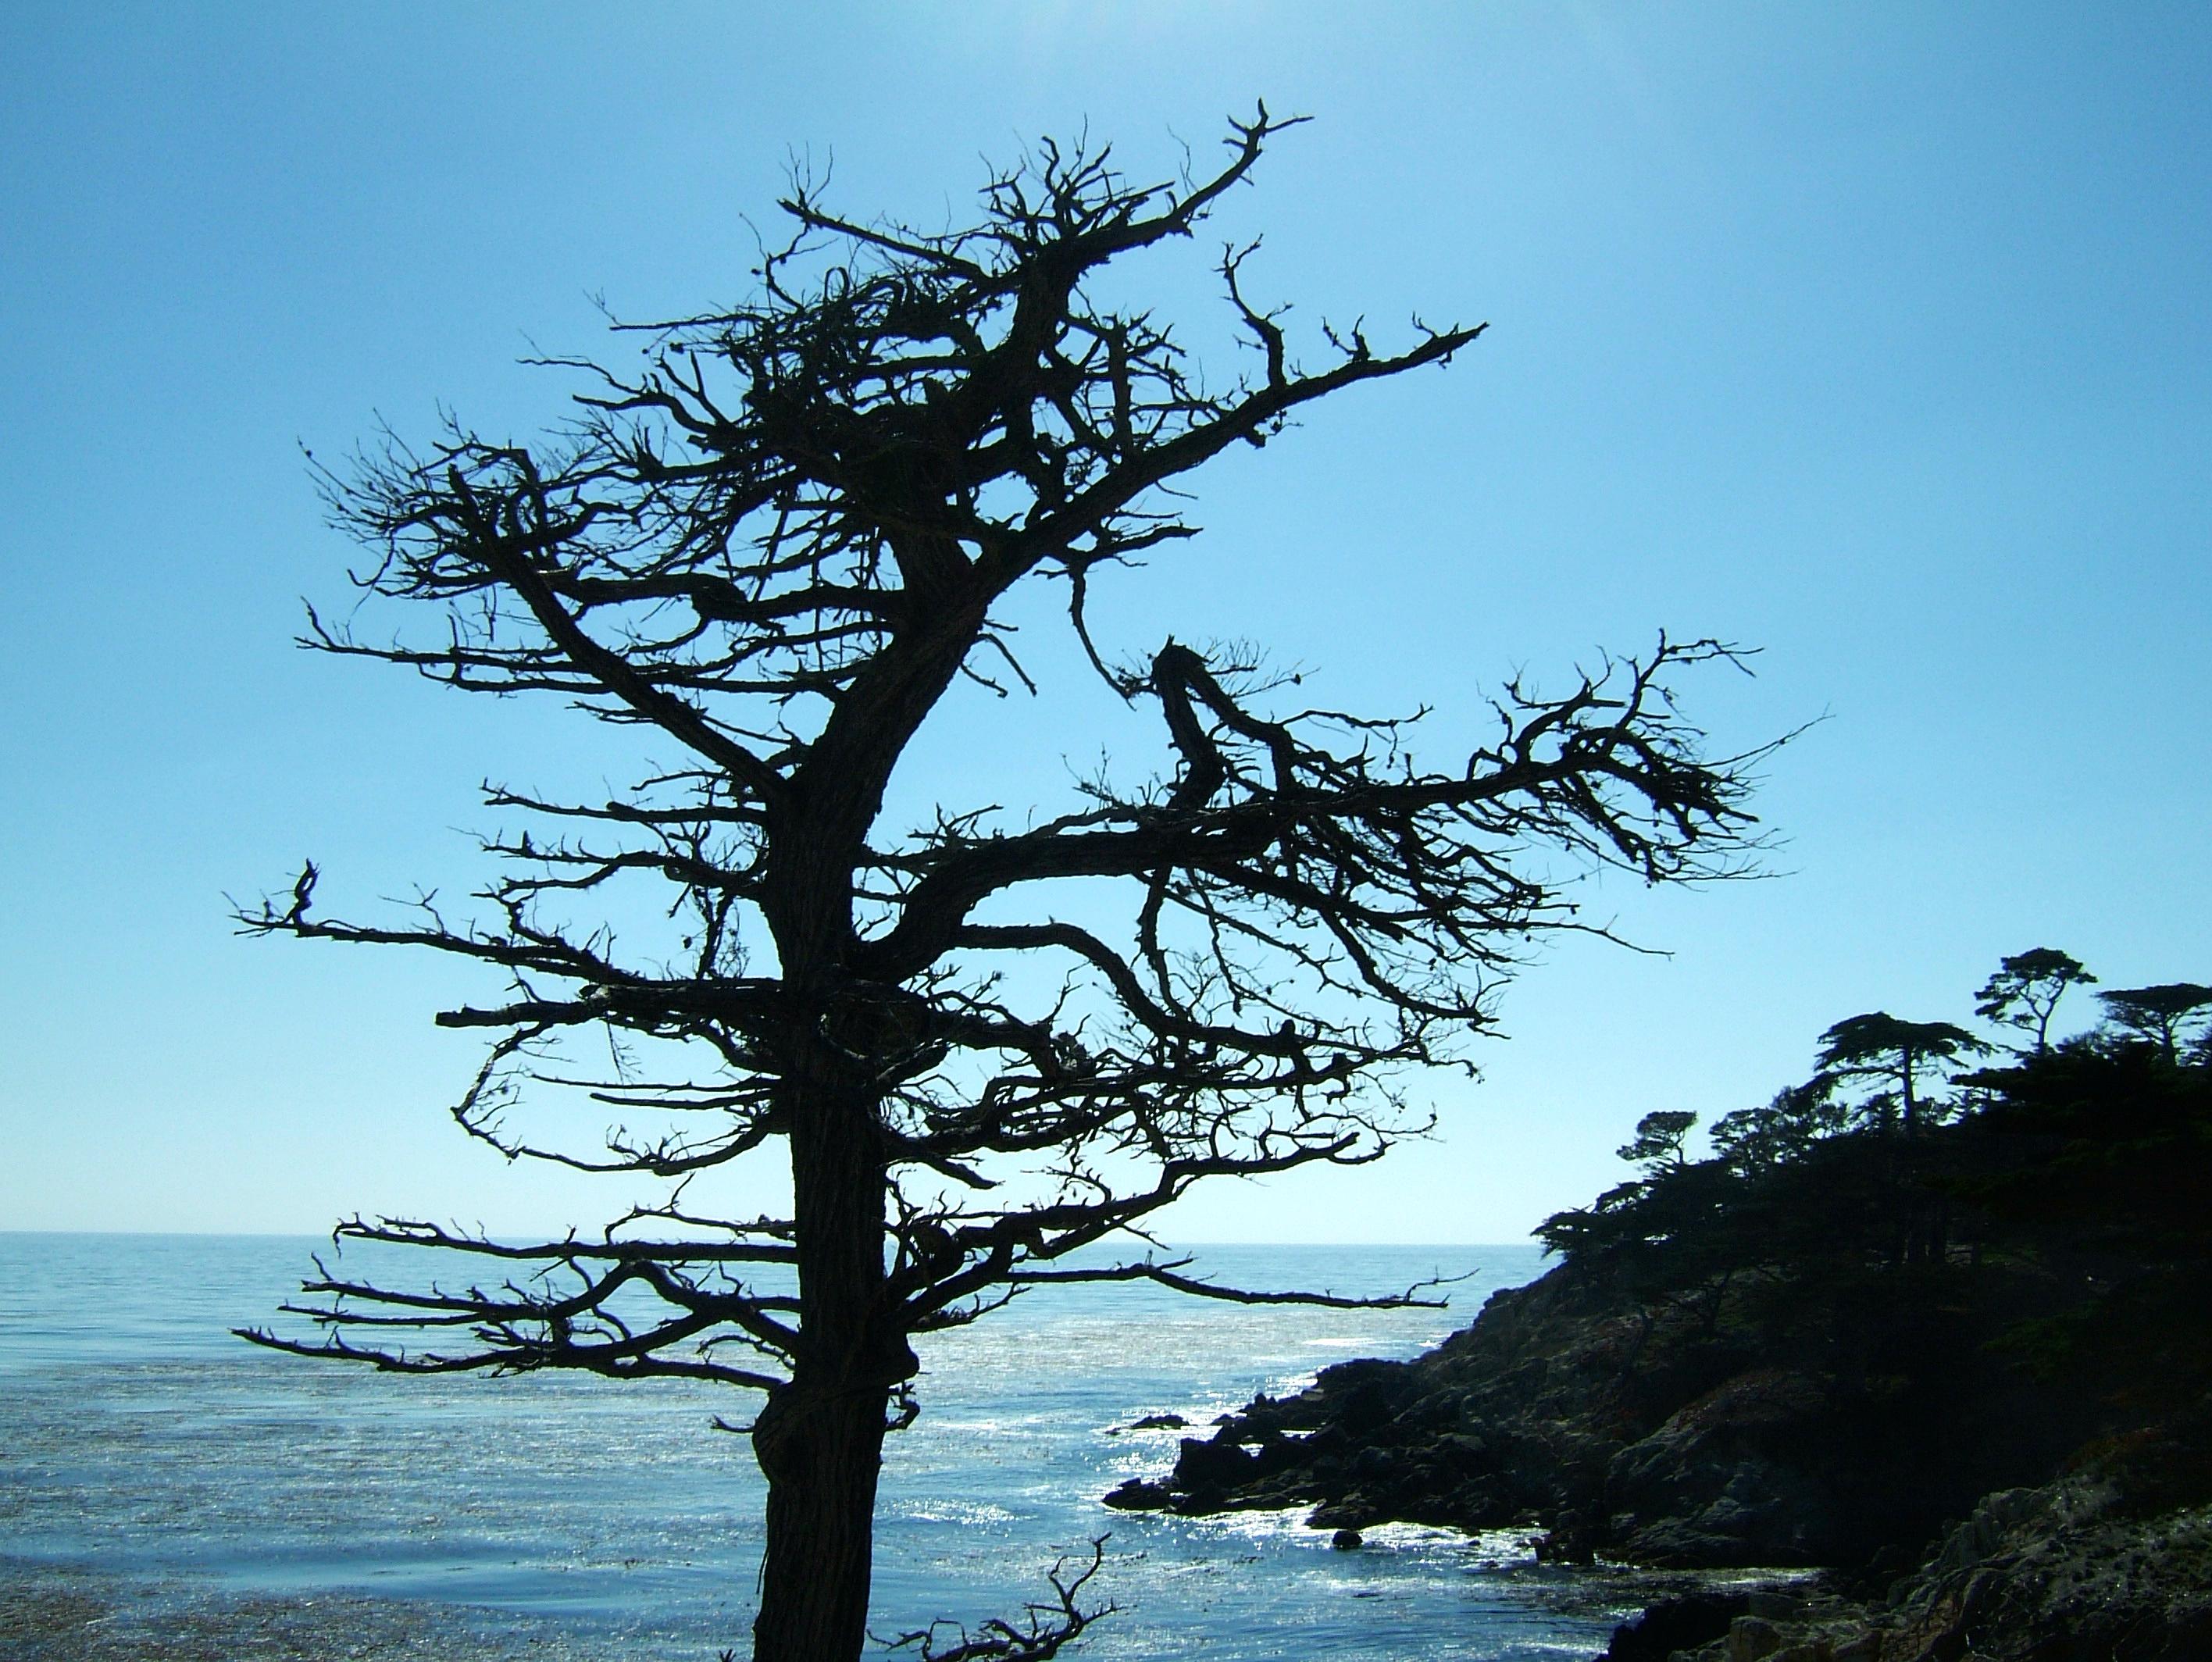 Tree USA California Monterey Pebble Beach 08